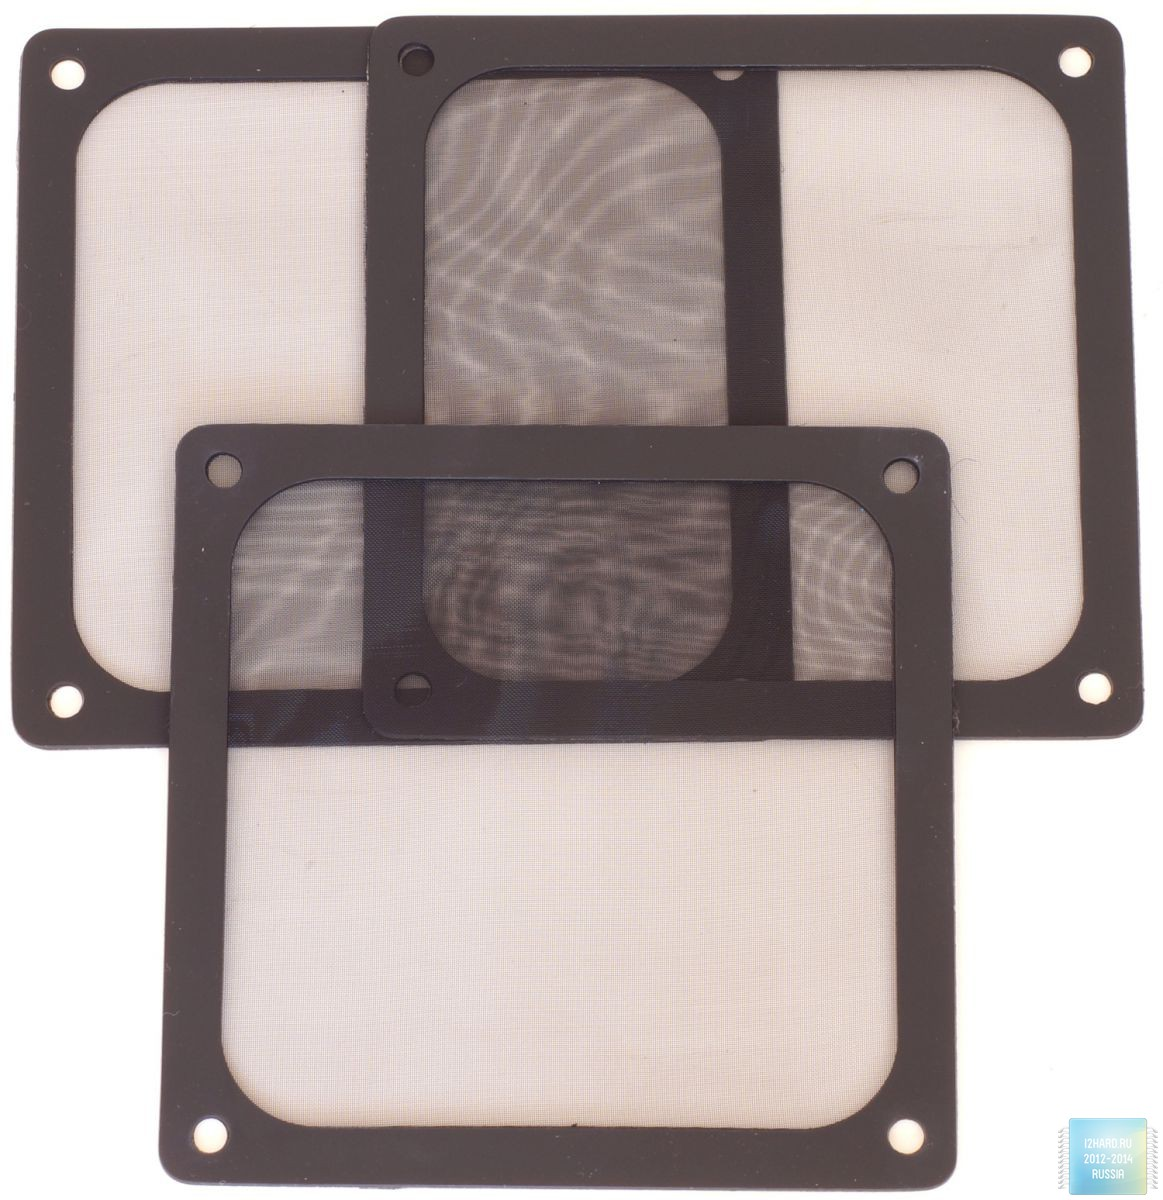 Упаковка и комплектация корпуса SilverStone RAVEN RVZ01-E